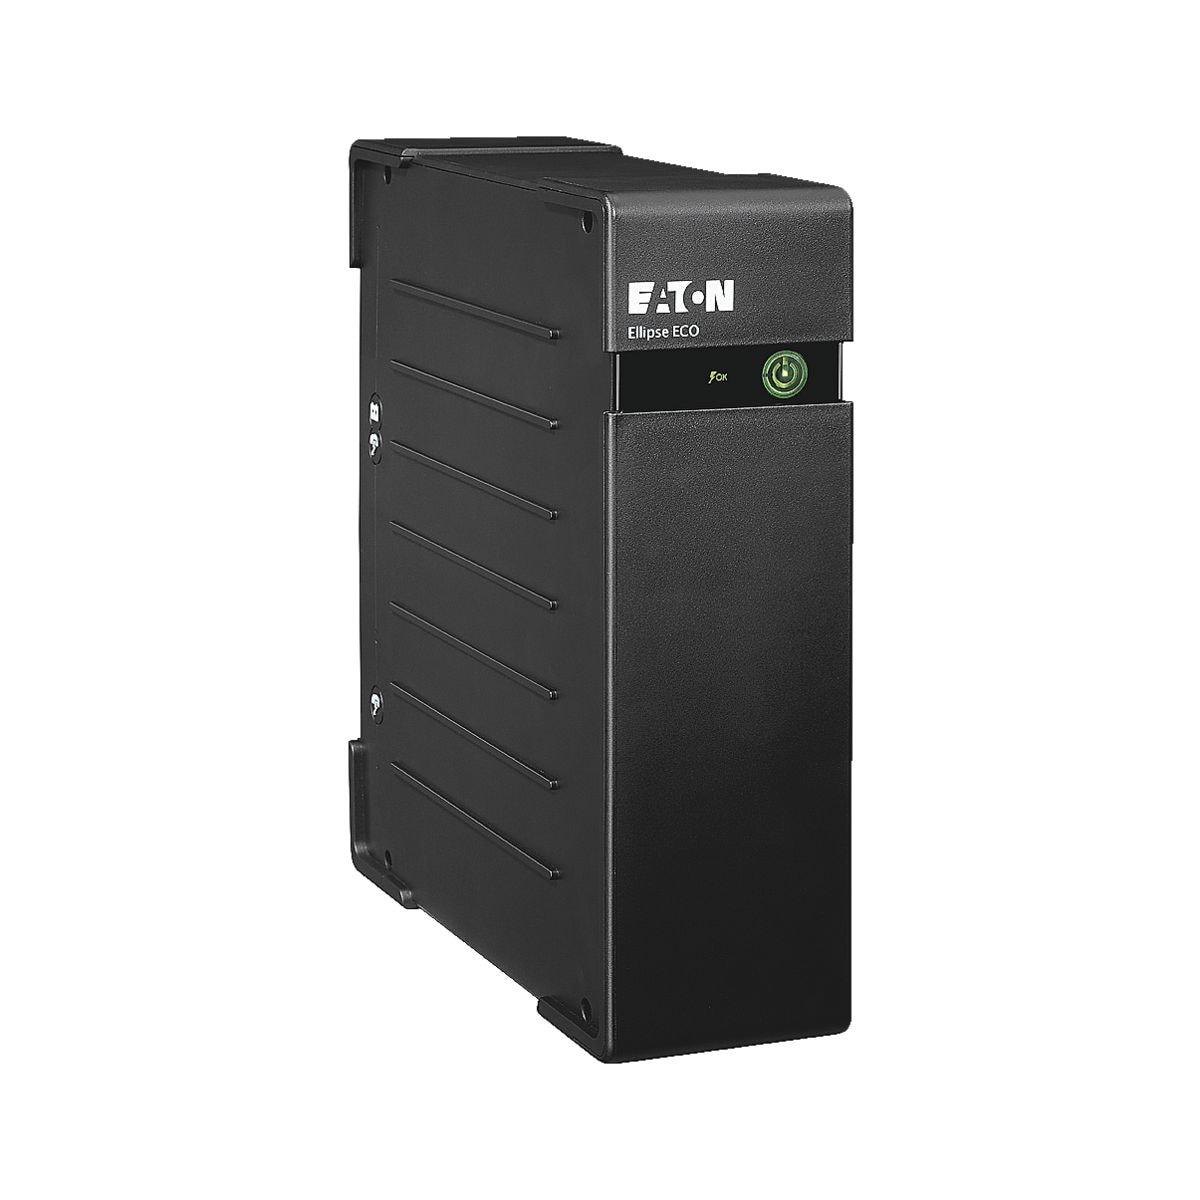 Eaton Unterbrechungsfreie Stromversorgung (USV) »Ellipse ECO 800 USB«